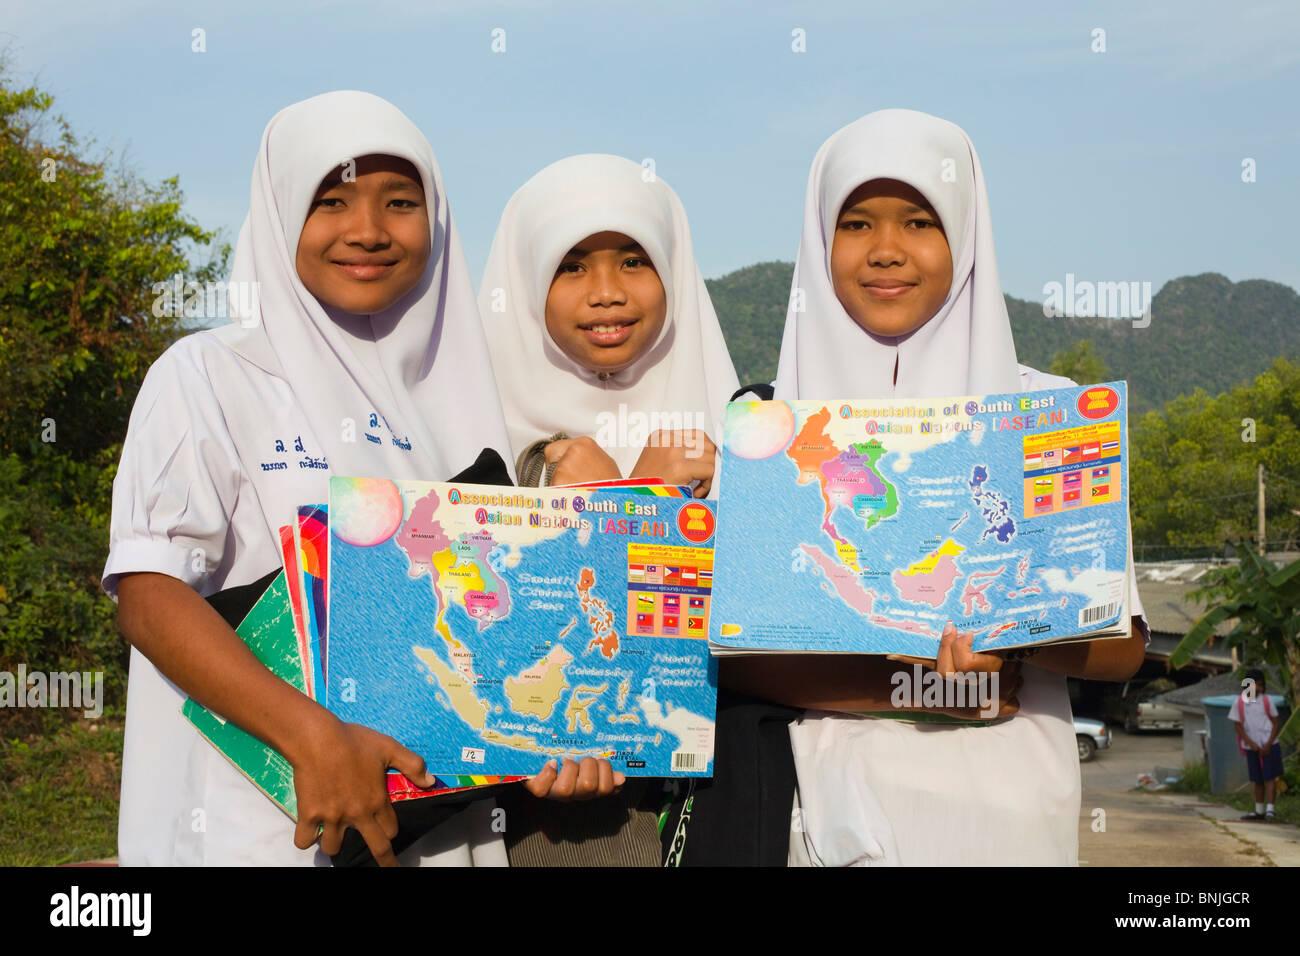 Muslims in phuket